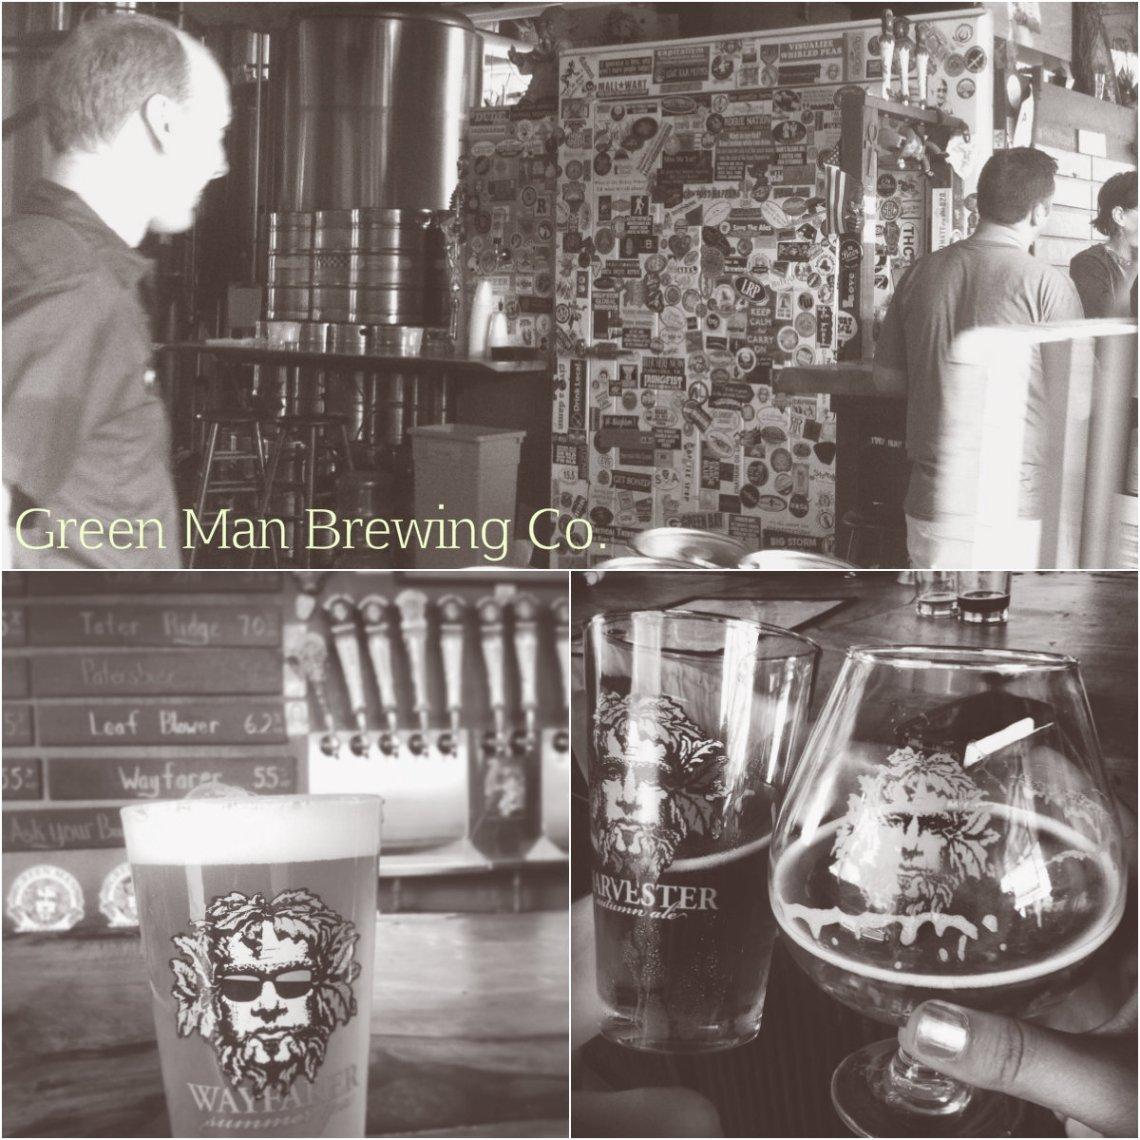 Green Man Brewing Co.